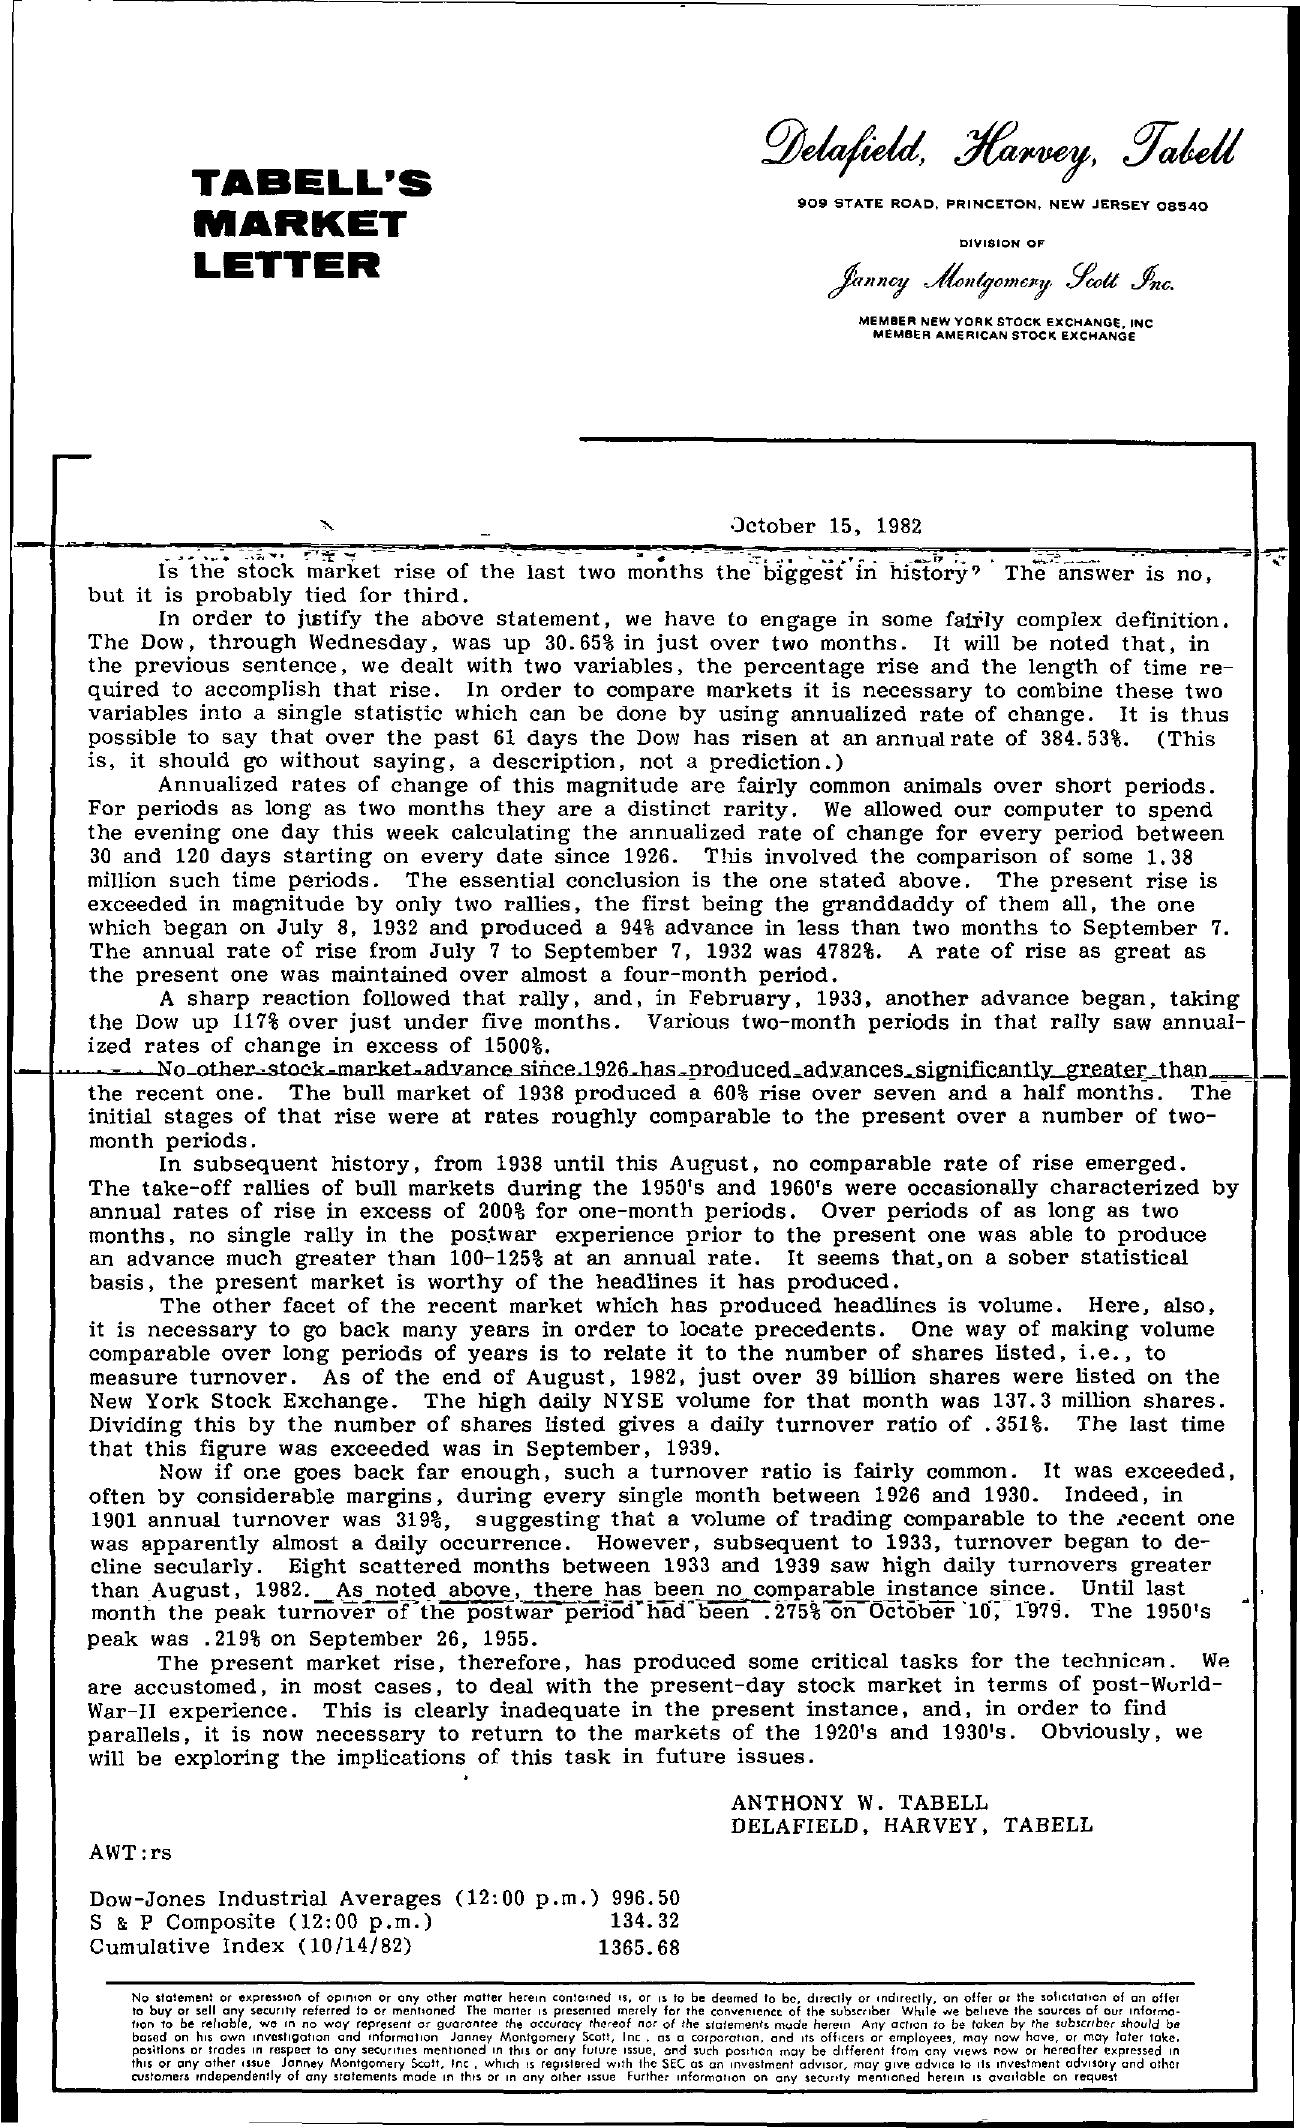 Tabell's Market Letter - October 15, 1982